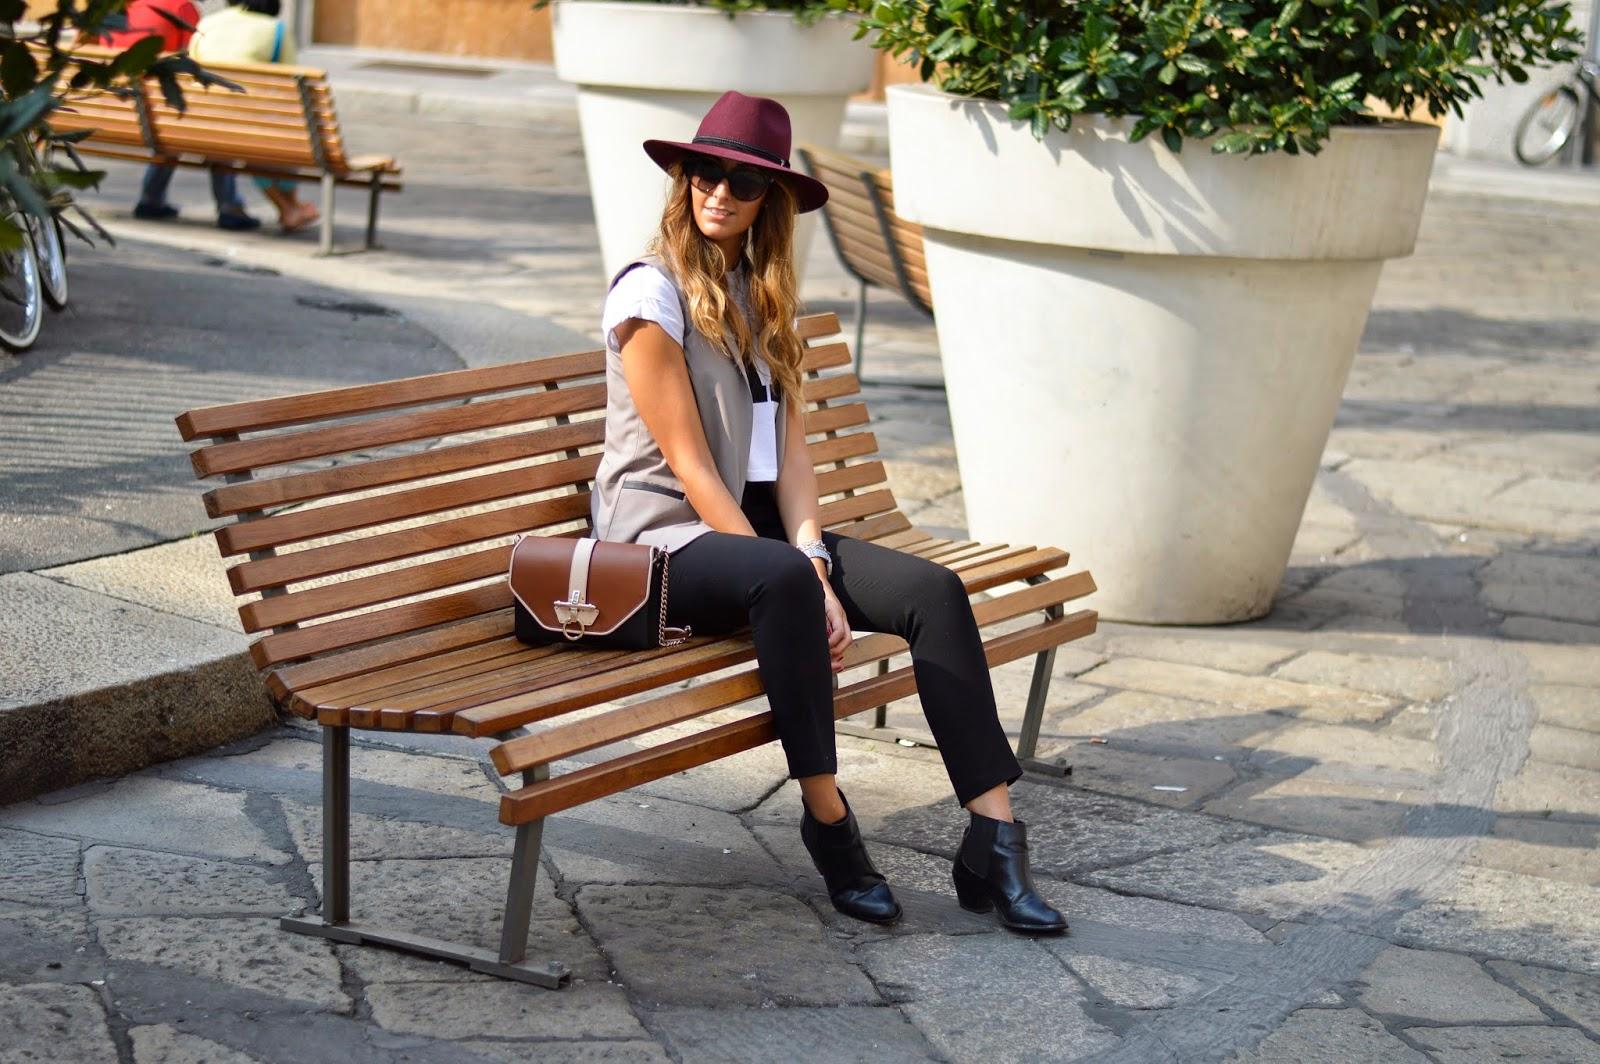 Milano fashion week, settimana della moda, streetstyle milano, streetstyle hat, panizza hat, burgundy hat, fashion, fashion blogger italiane, elisa taviti, h&m shoes, givenchy bag, givenchy obsedia bag, pinko, pinko bag, milano fashion week look, milano fashion week outfit